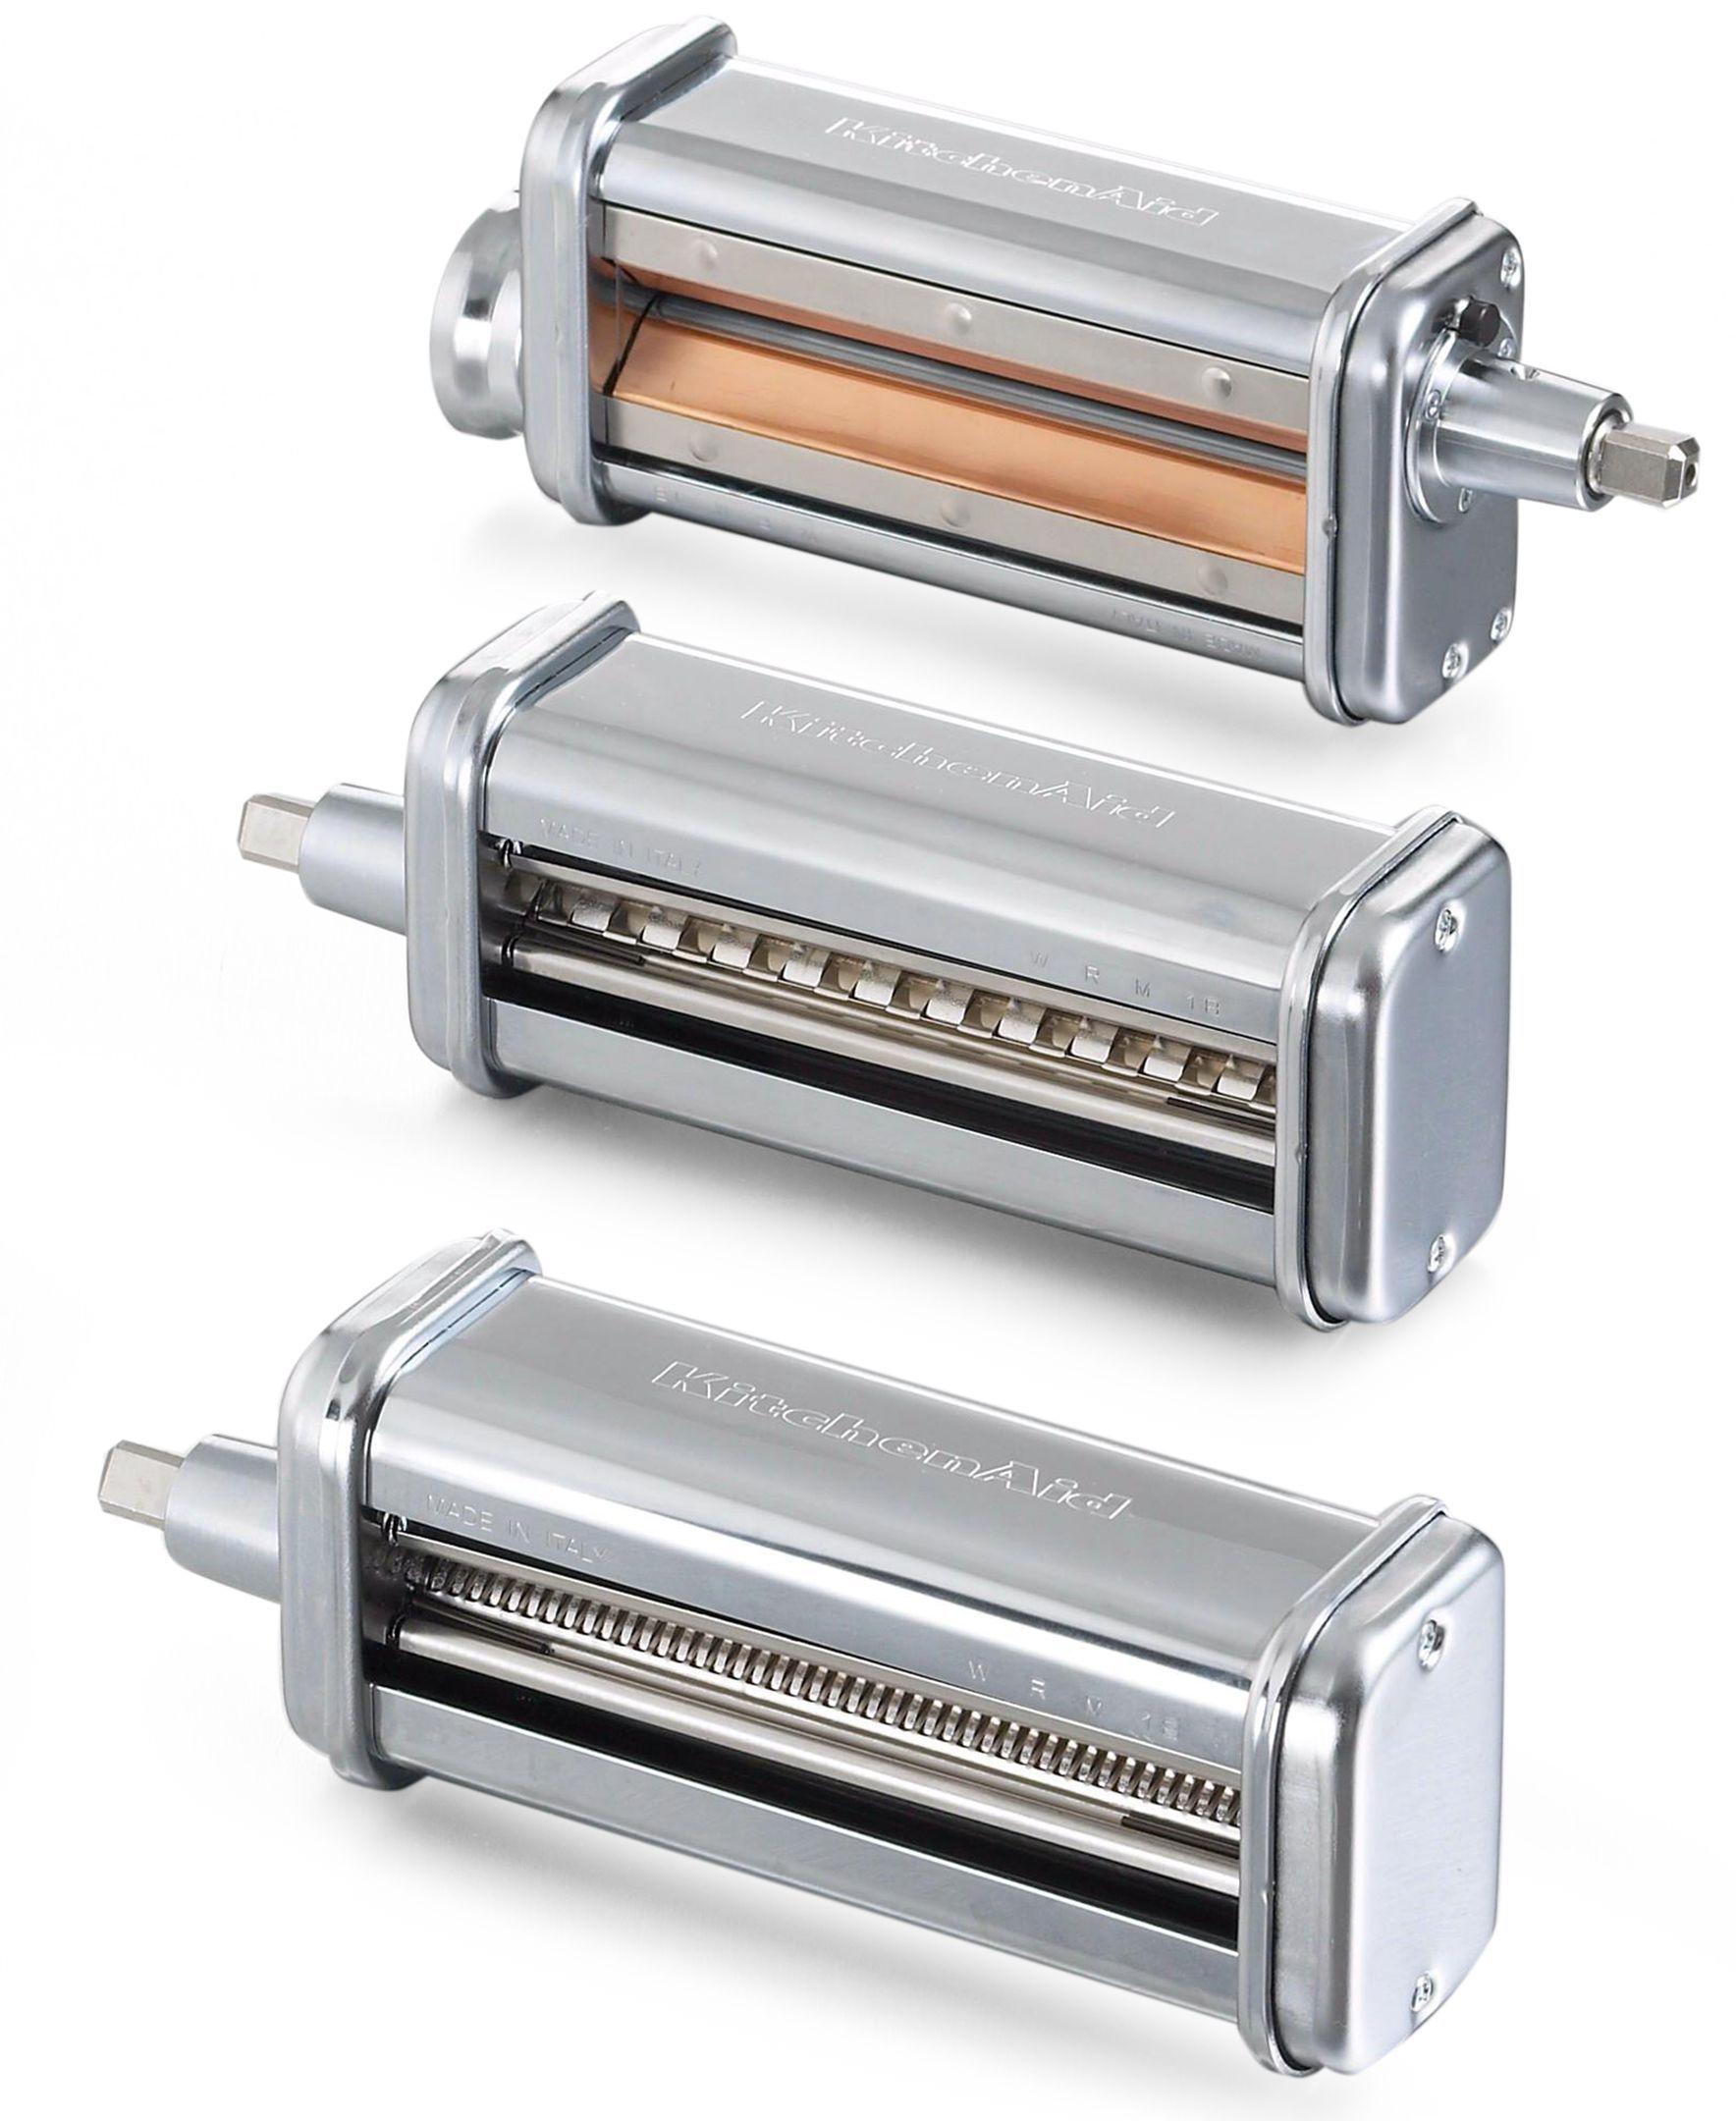 KitchenAid Kpra Pasta Roller Stand Mixer Attachment Set